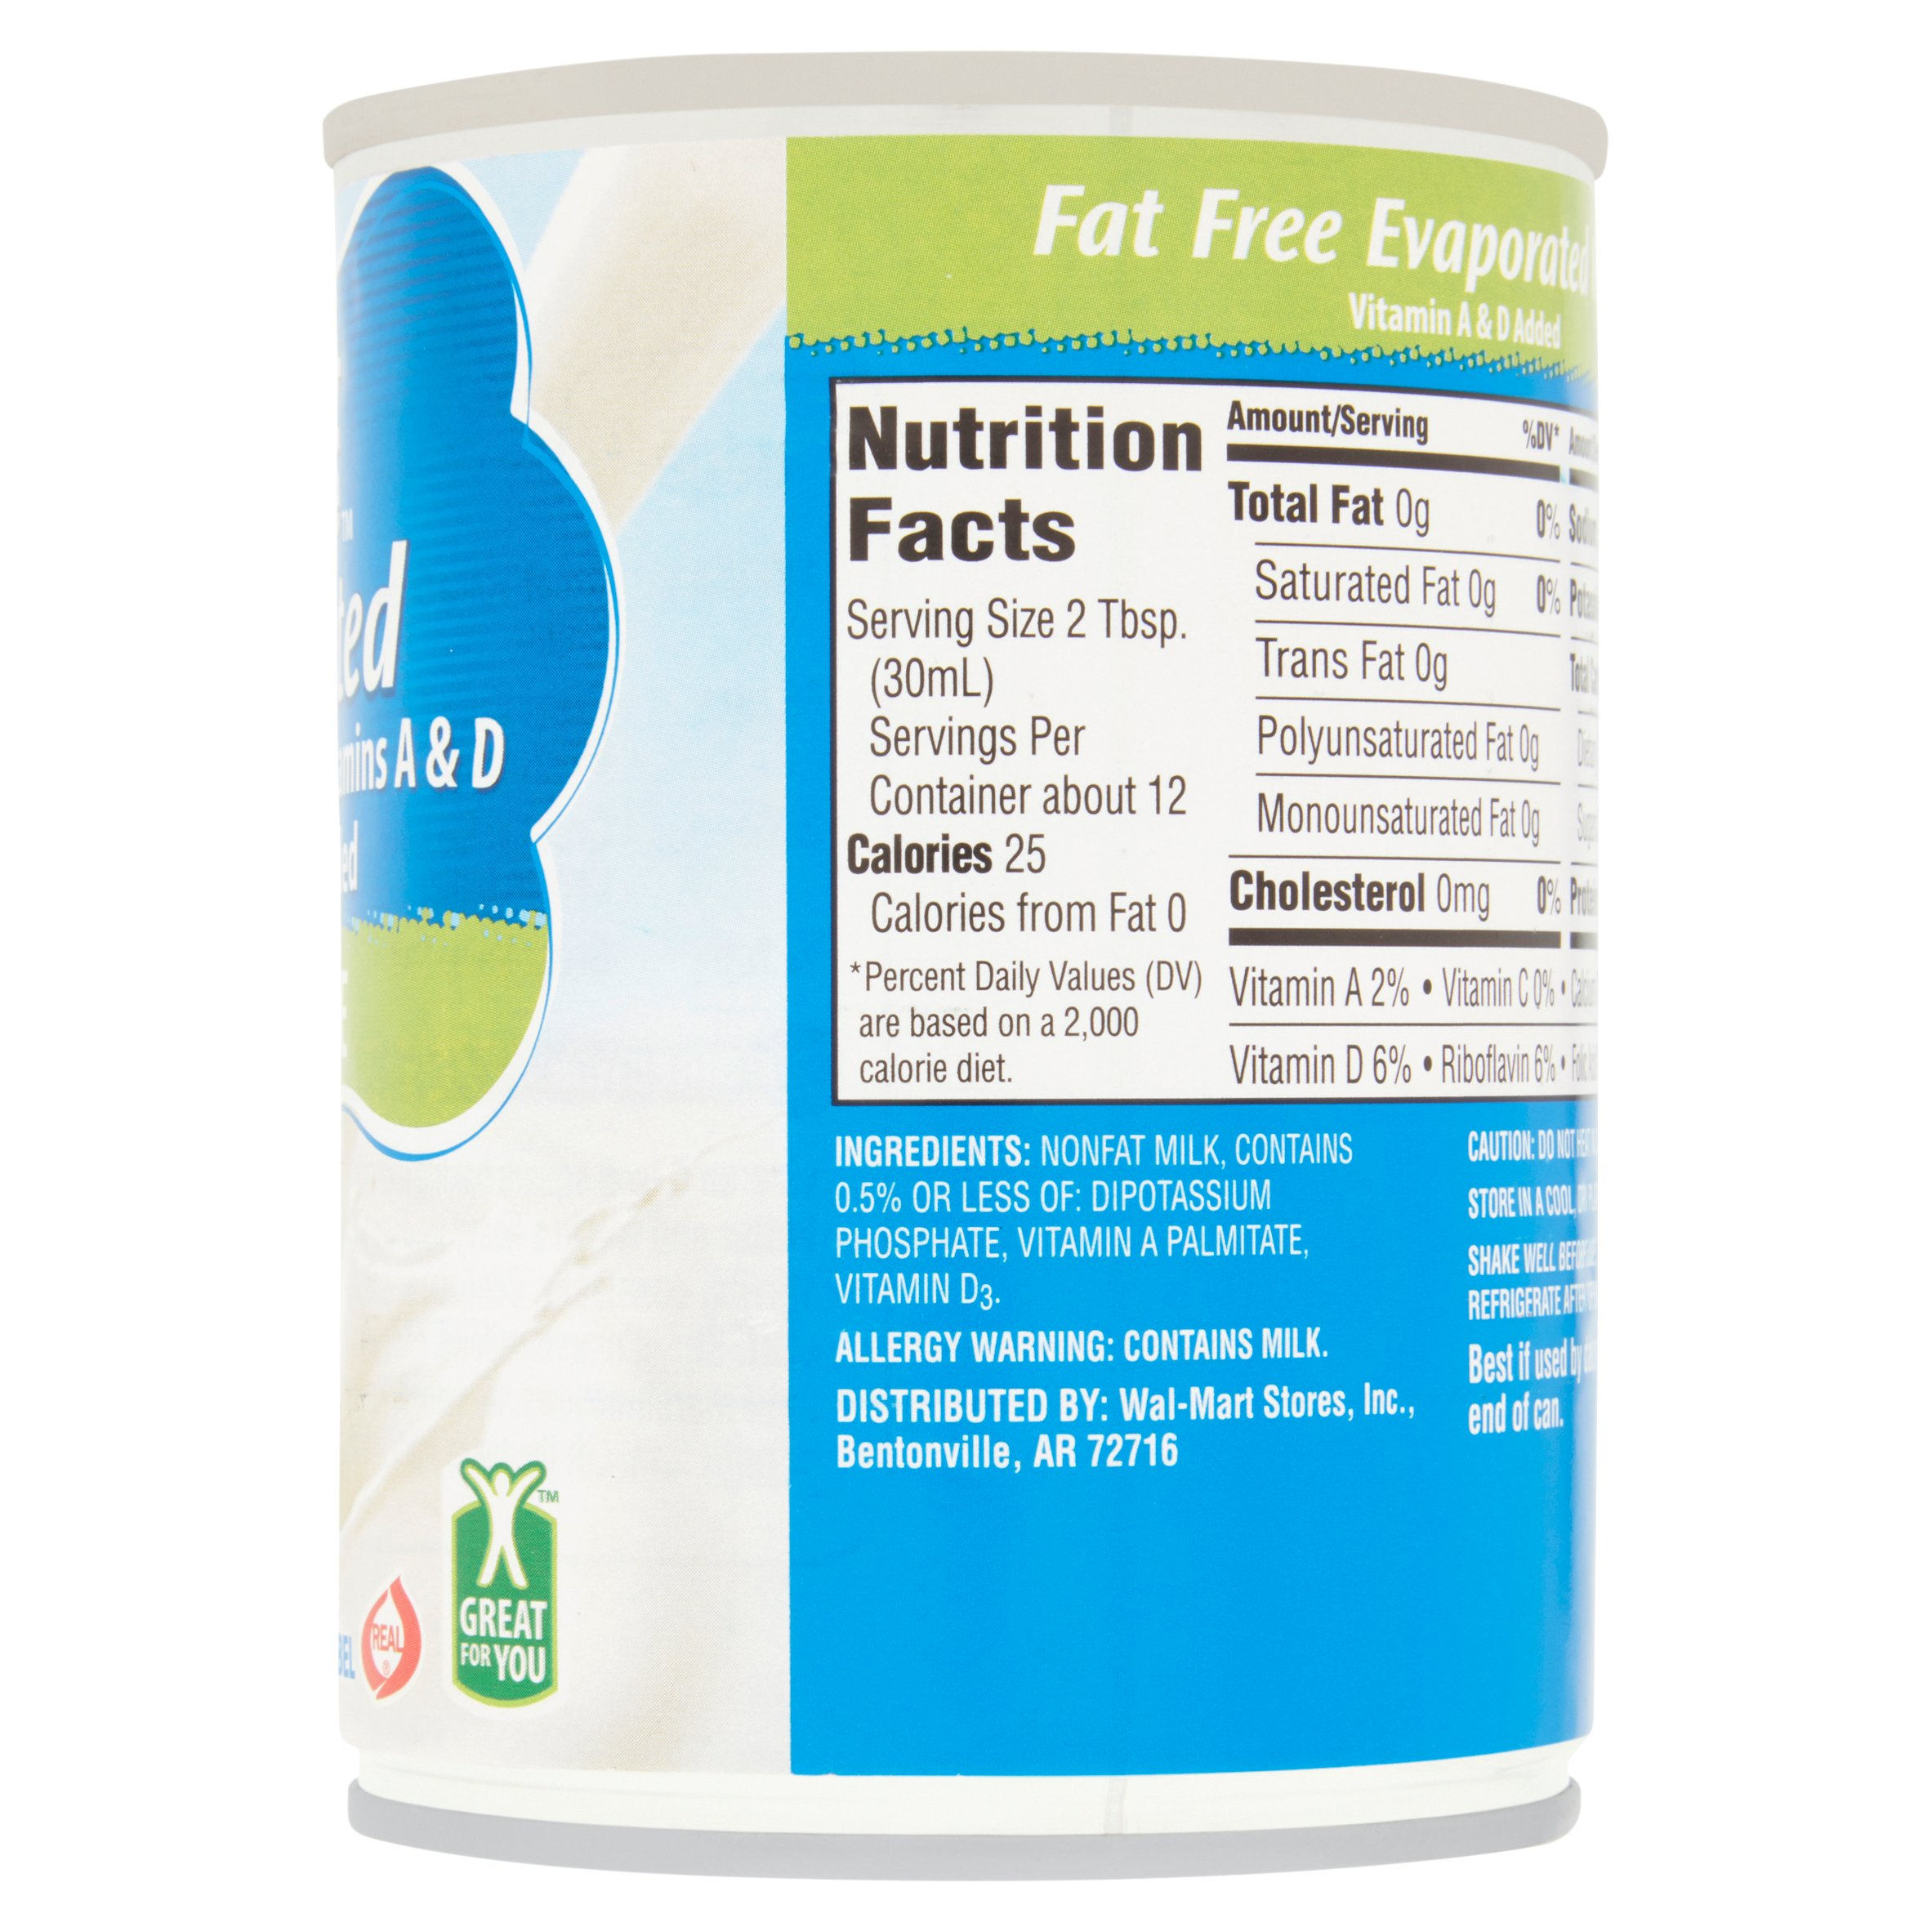 Great Value Evaporated Fat Free Milk, 12 oz - Walmart.com